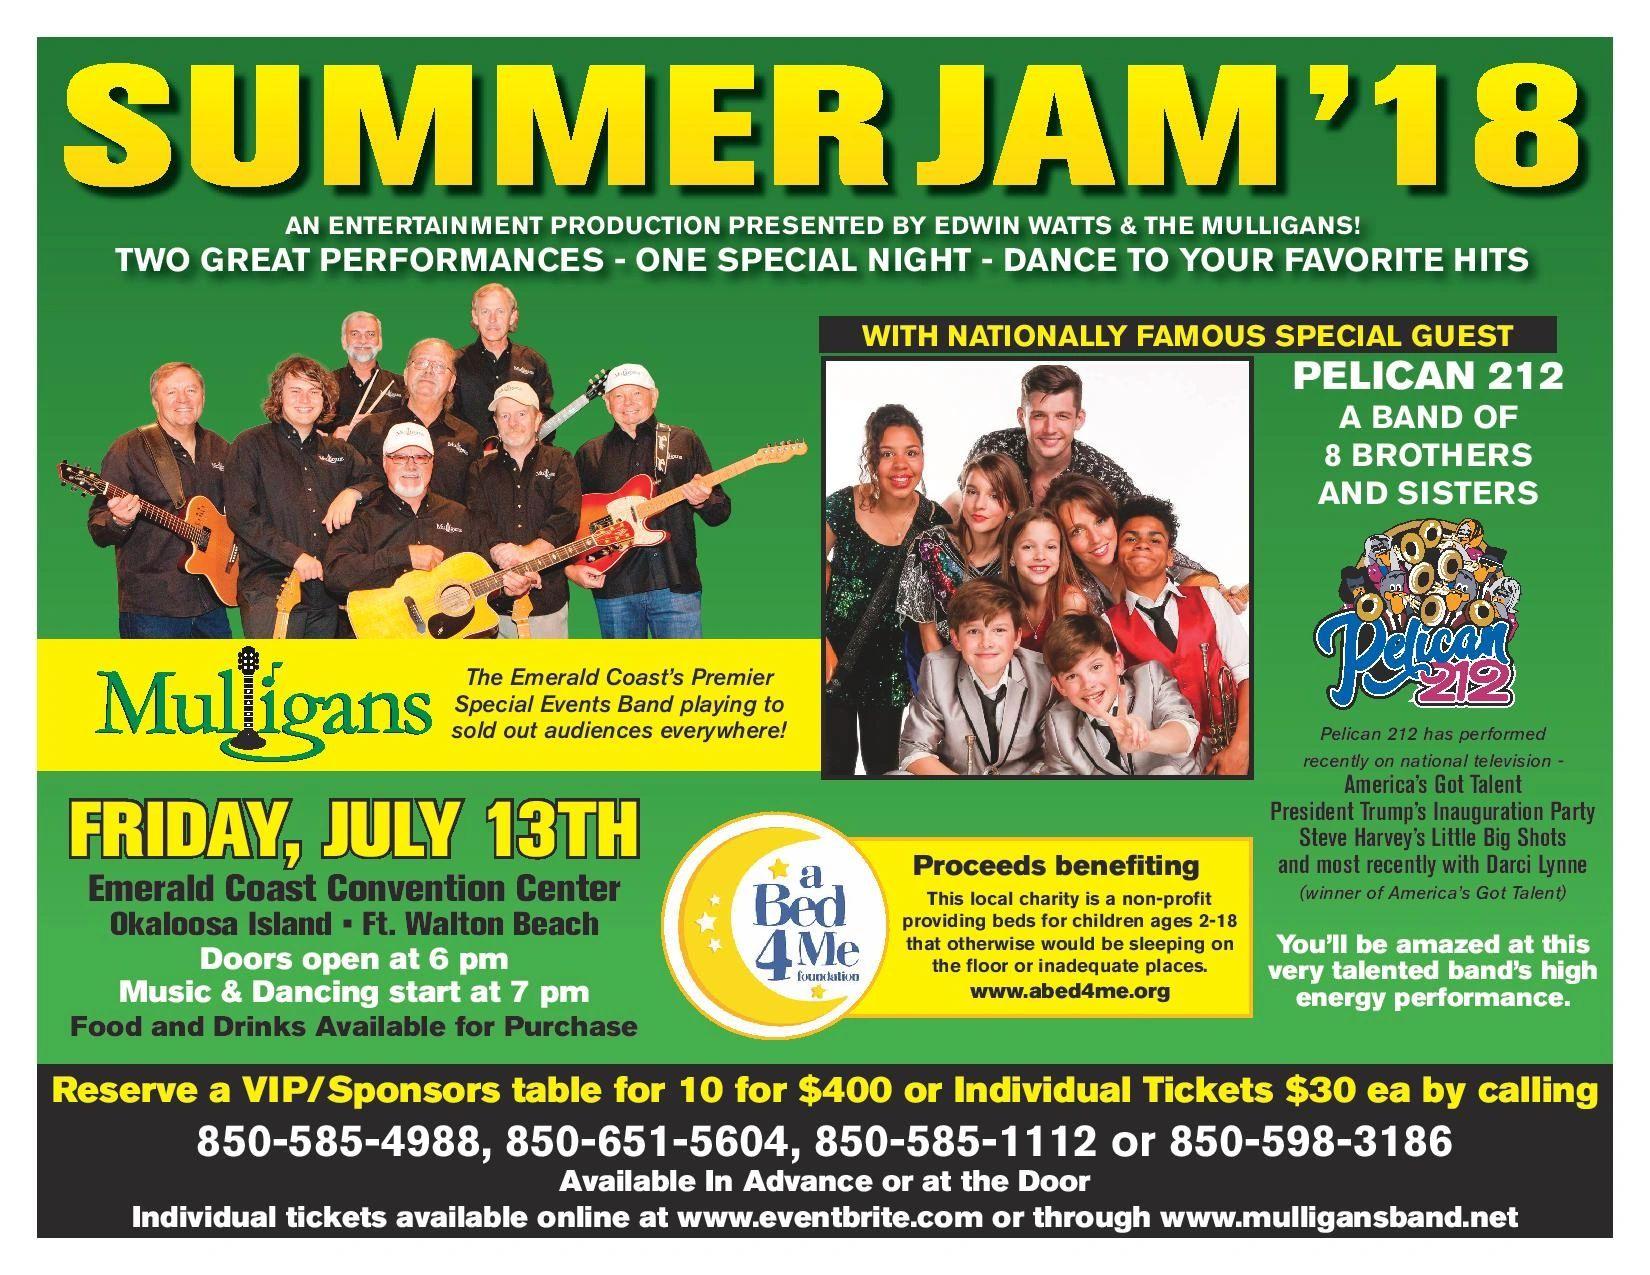 e82869caa Summer Jam '18